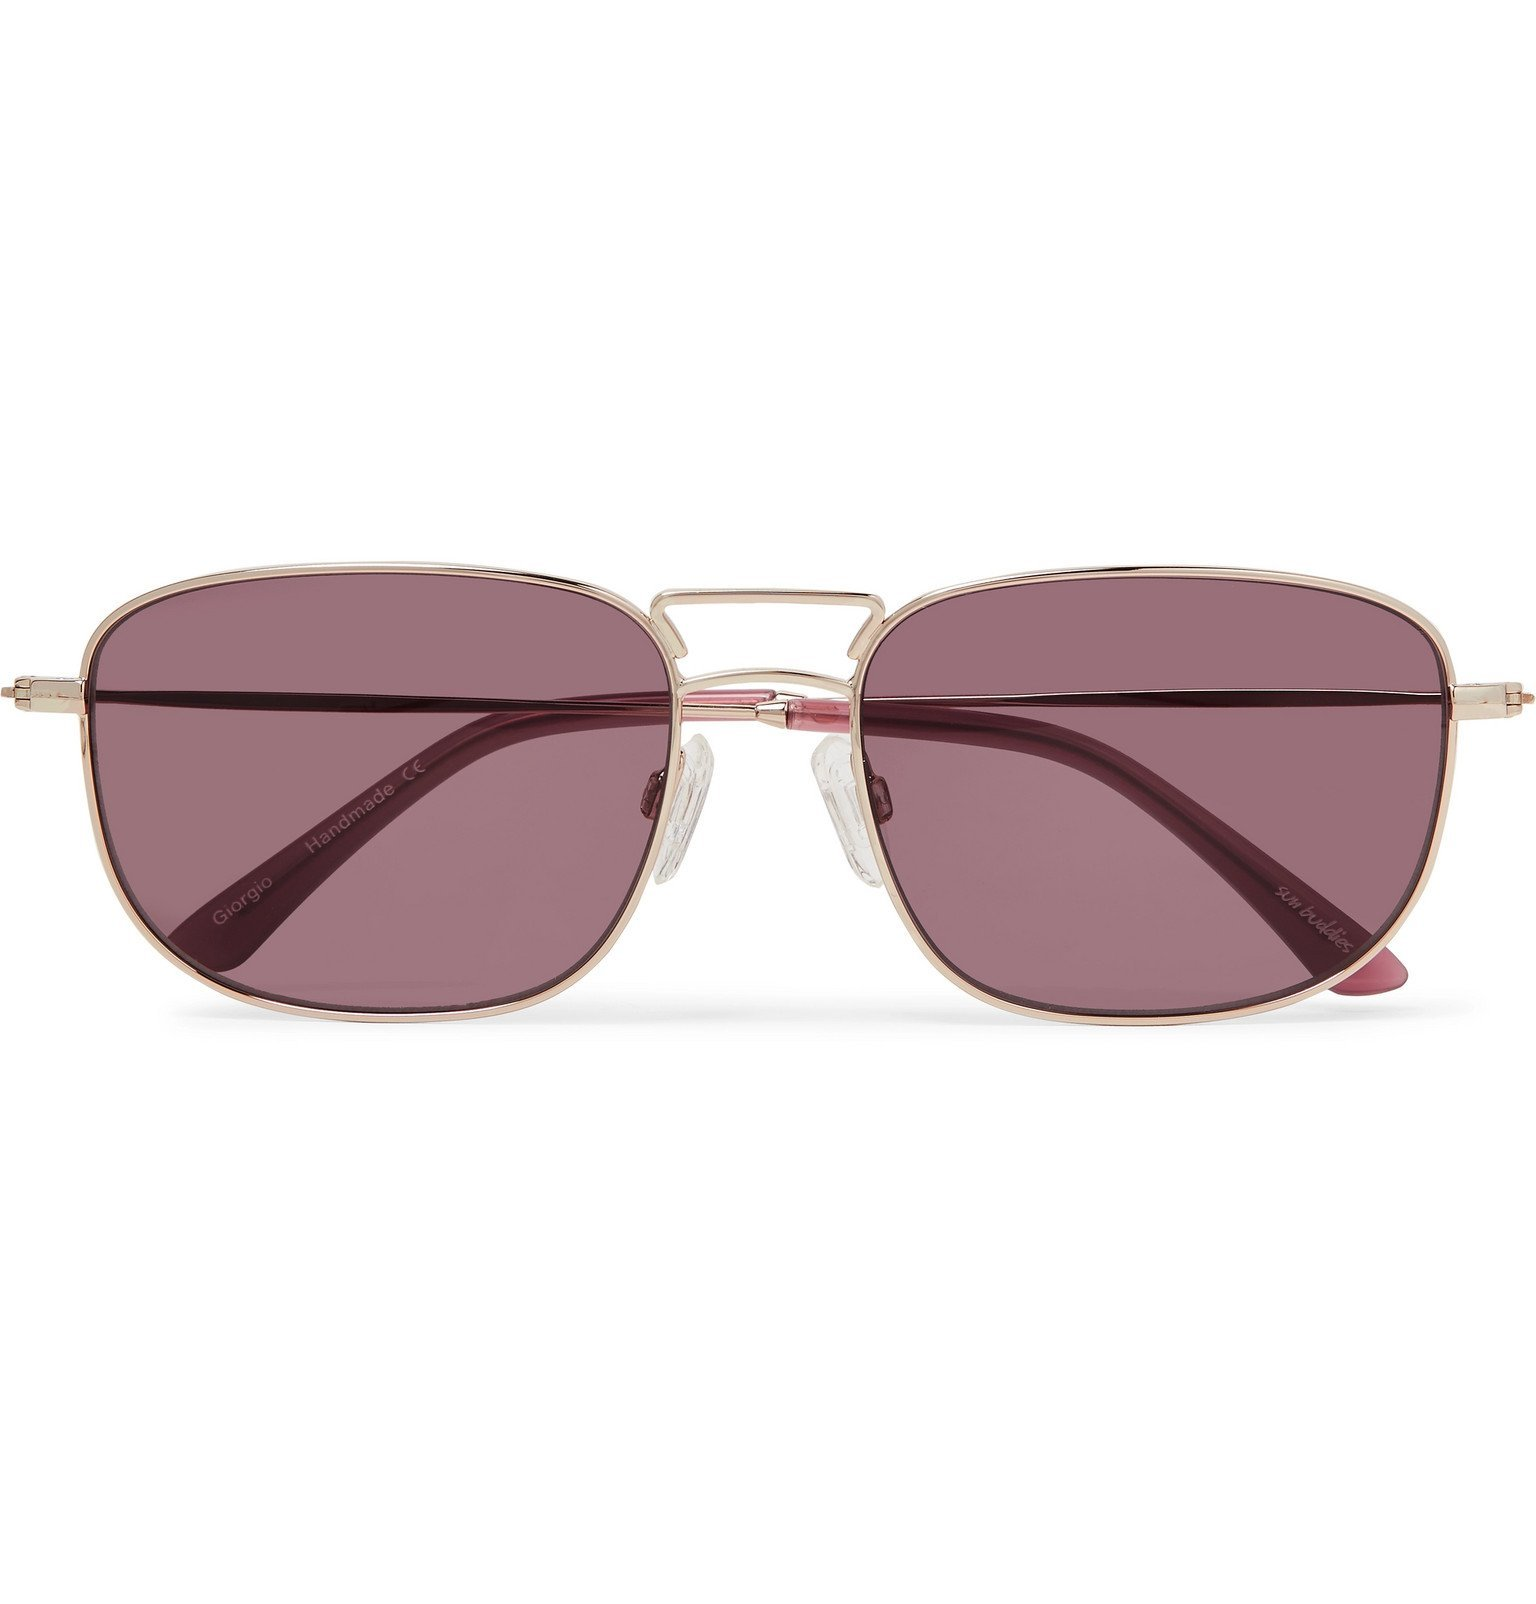 Photo: Sun Buddies - Giorgio Square-Frame Stainless Steel Sunglasses - Gold